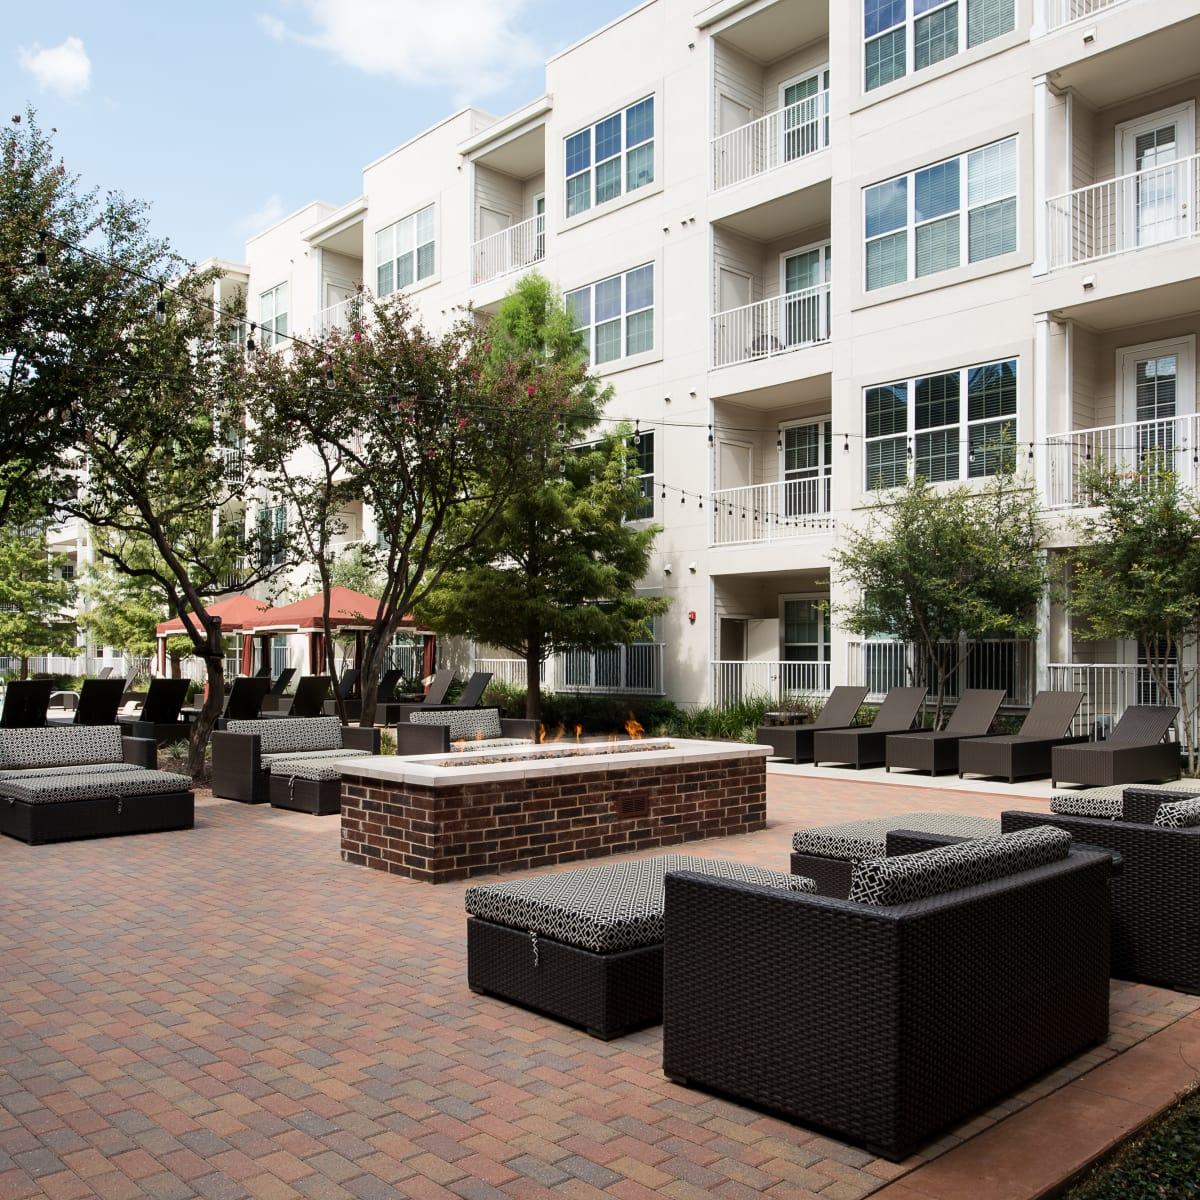 4110 Fairmount apartments in Dallas